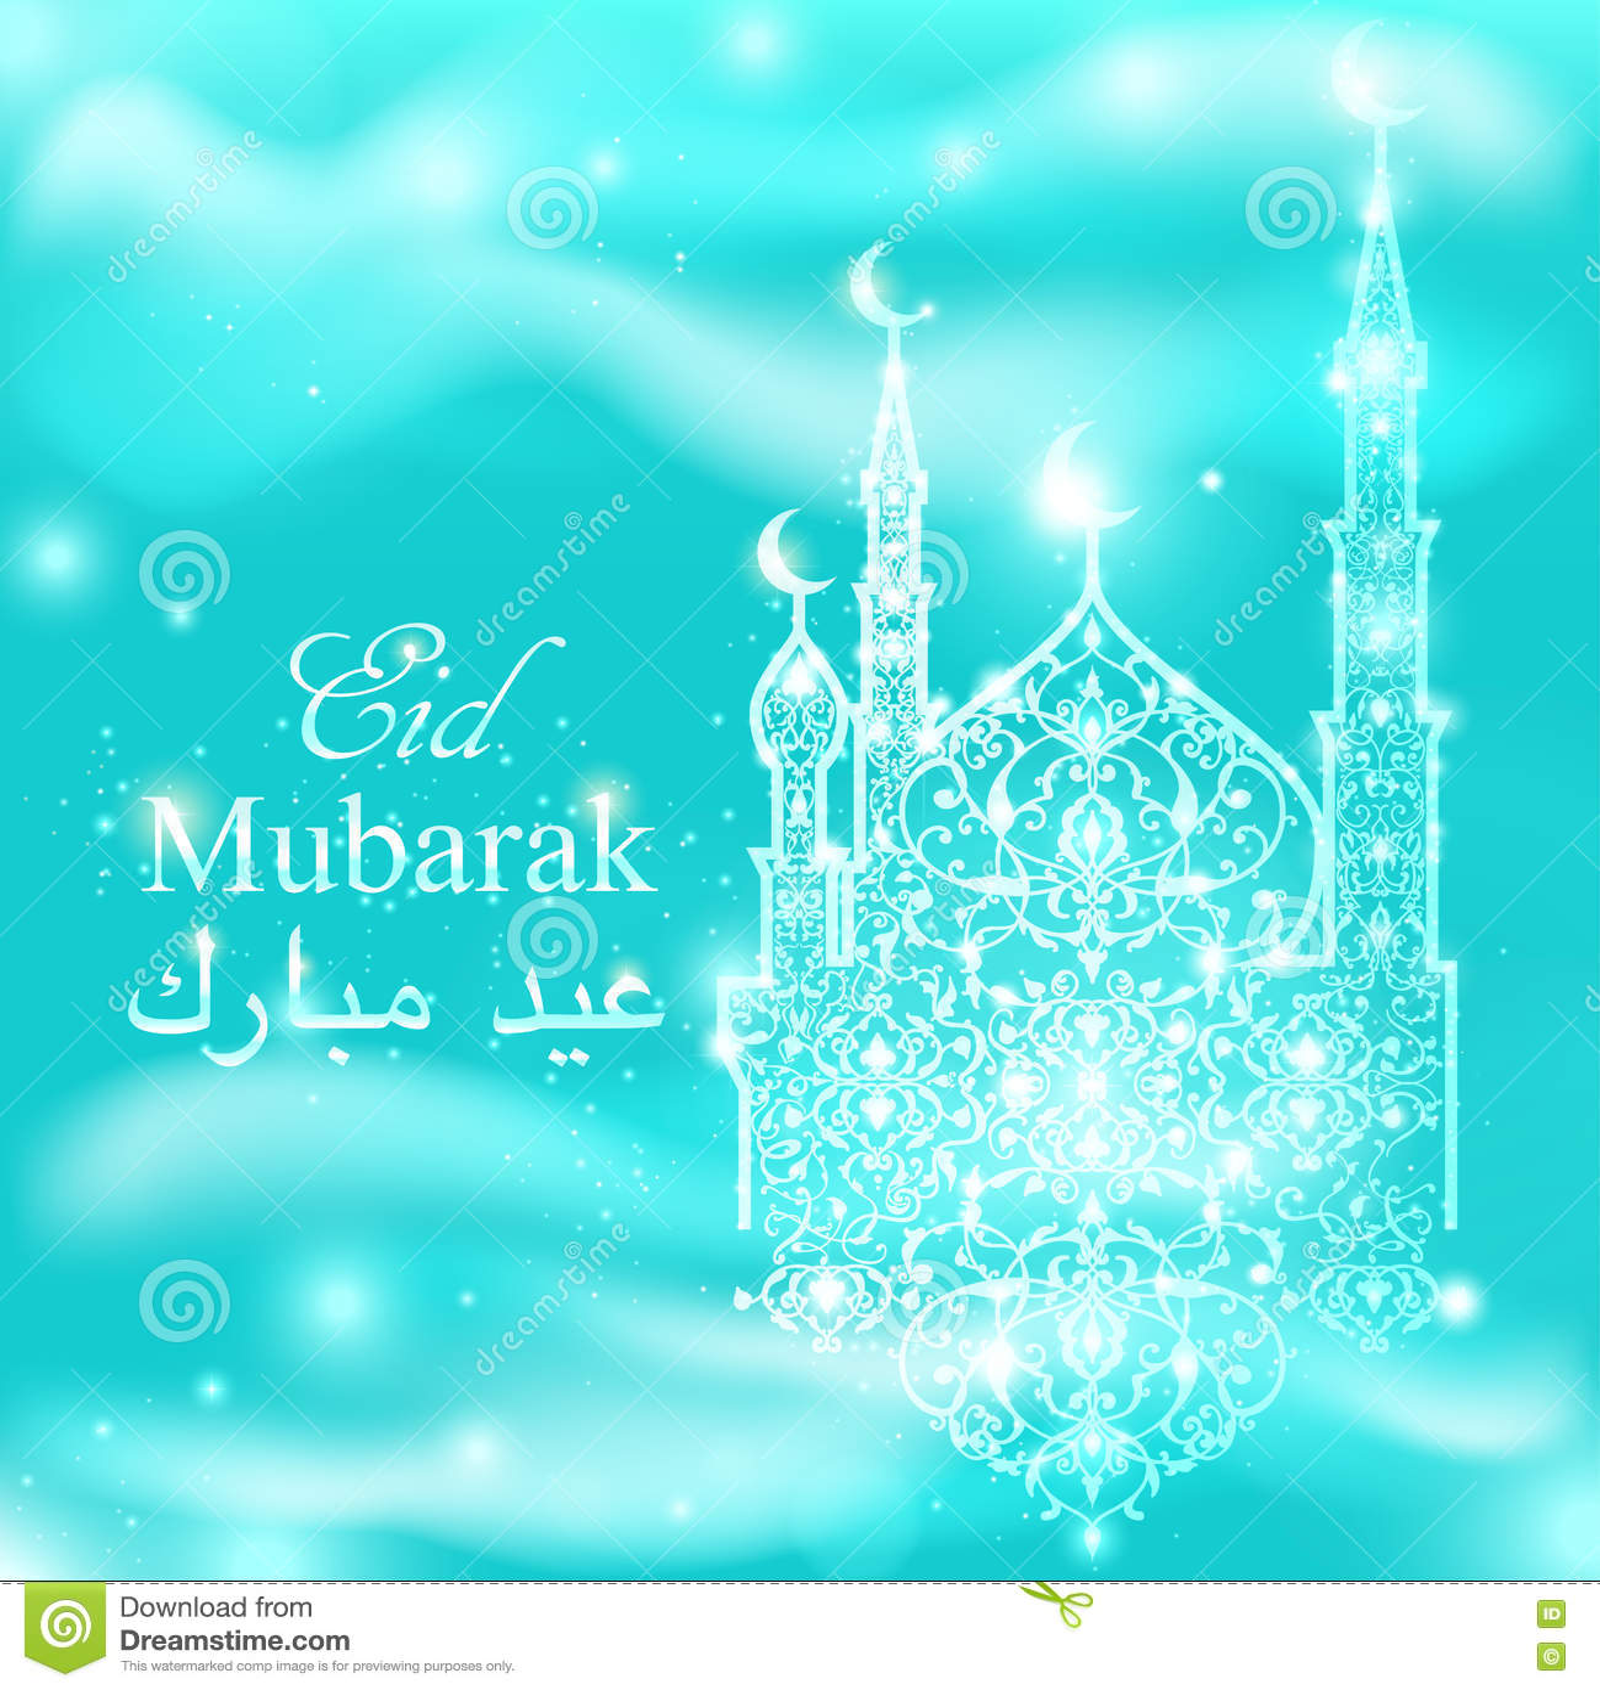 English Translate Eid Mubarak Beautiful Mosque On Sparkling Lights